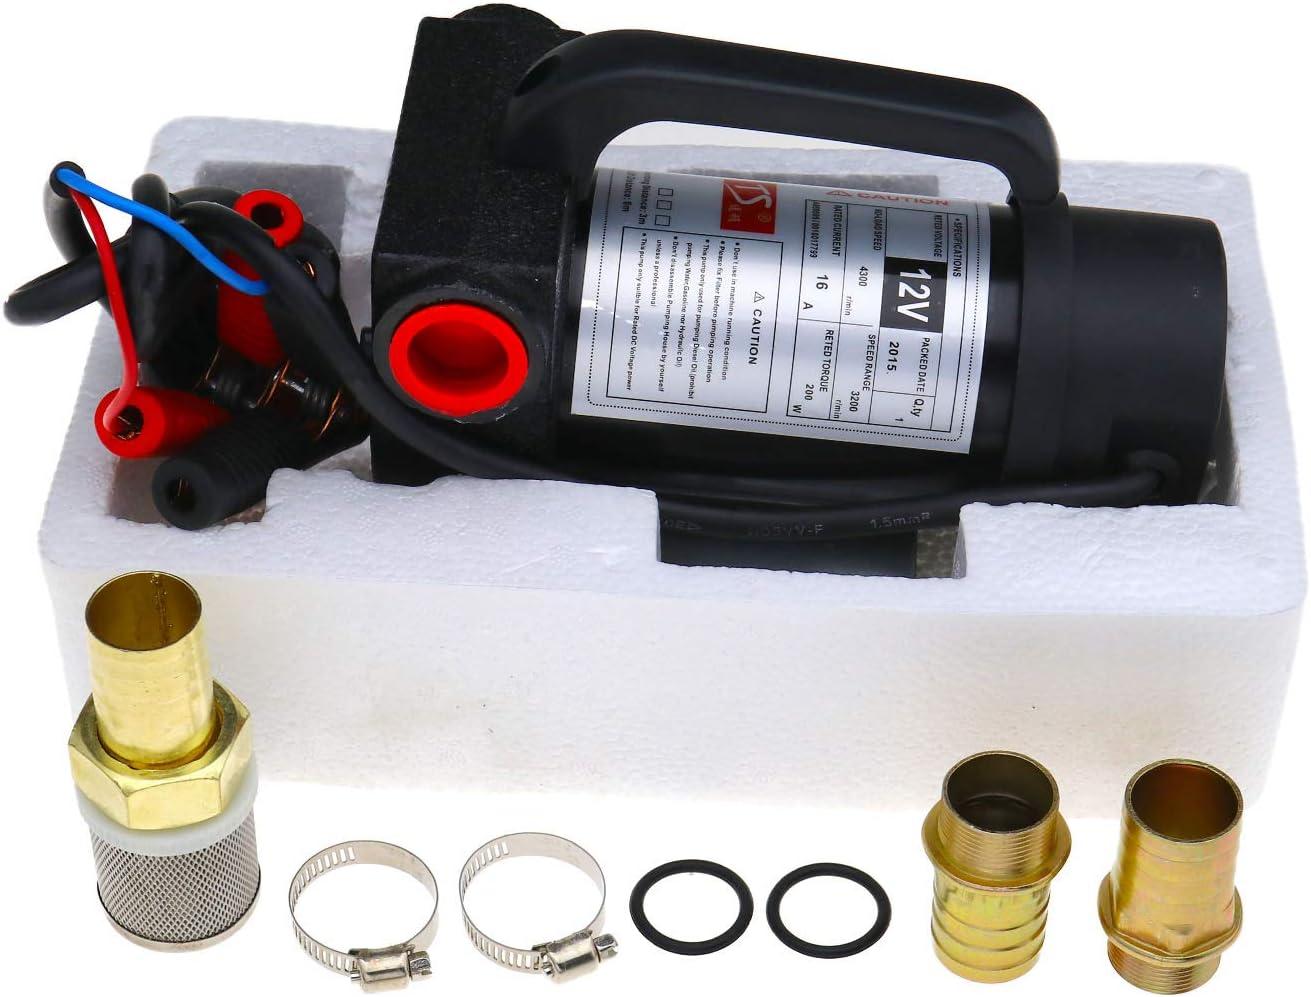 ENET Set von 200W 42L//min Diesel Fluid Extractor Electric Transfer DC 12V Kraftstoffpumpe Hochgeschwindigkeits-Kraftstoffpumpe Kit